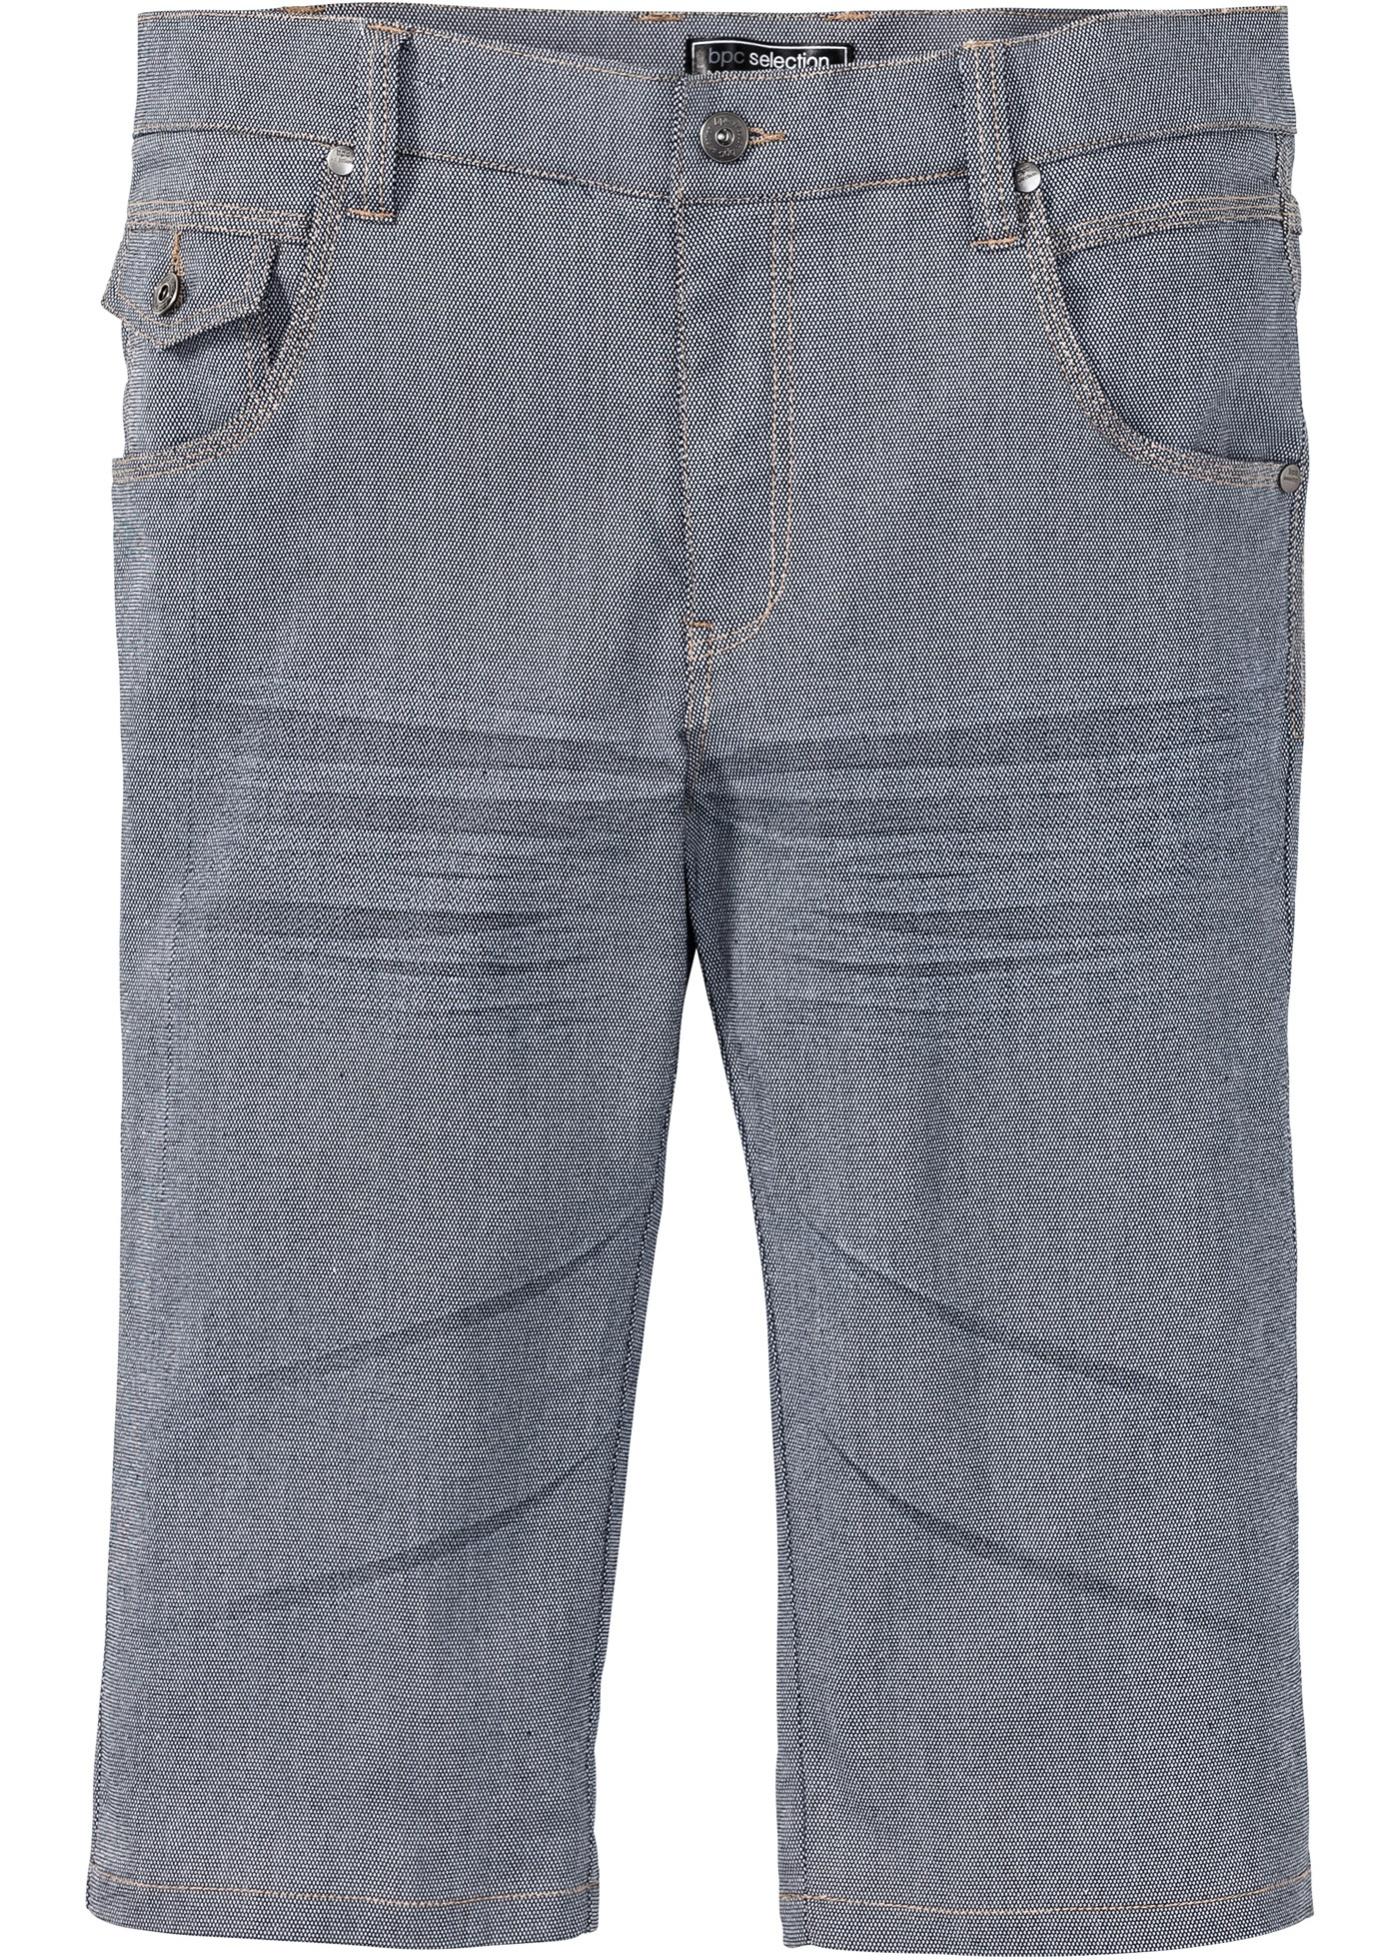 Bermuda long 5 poches